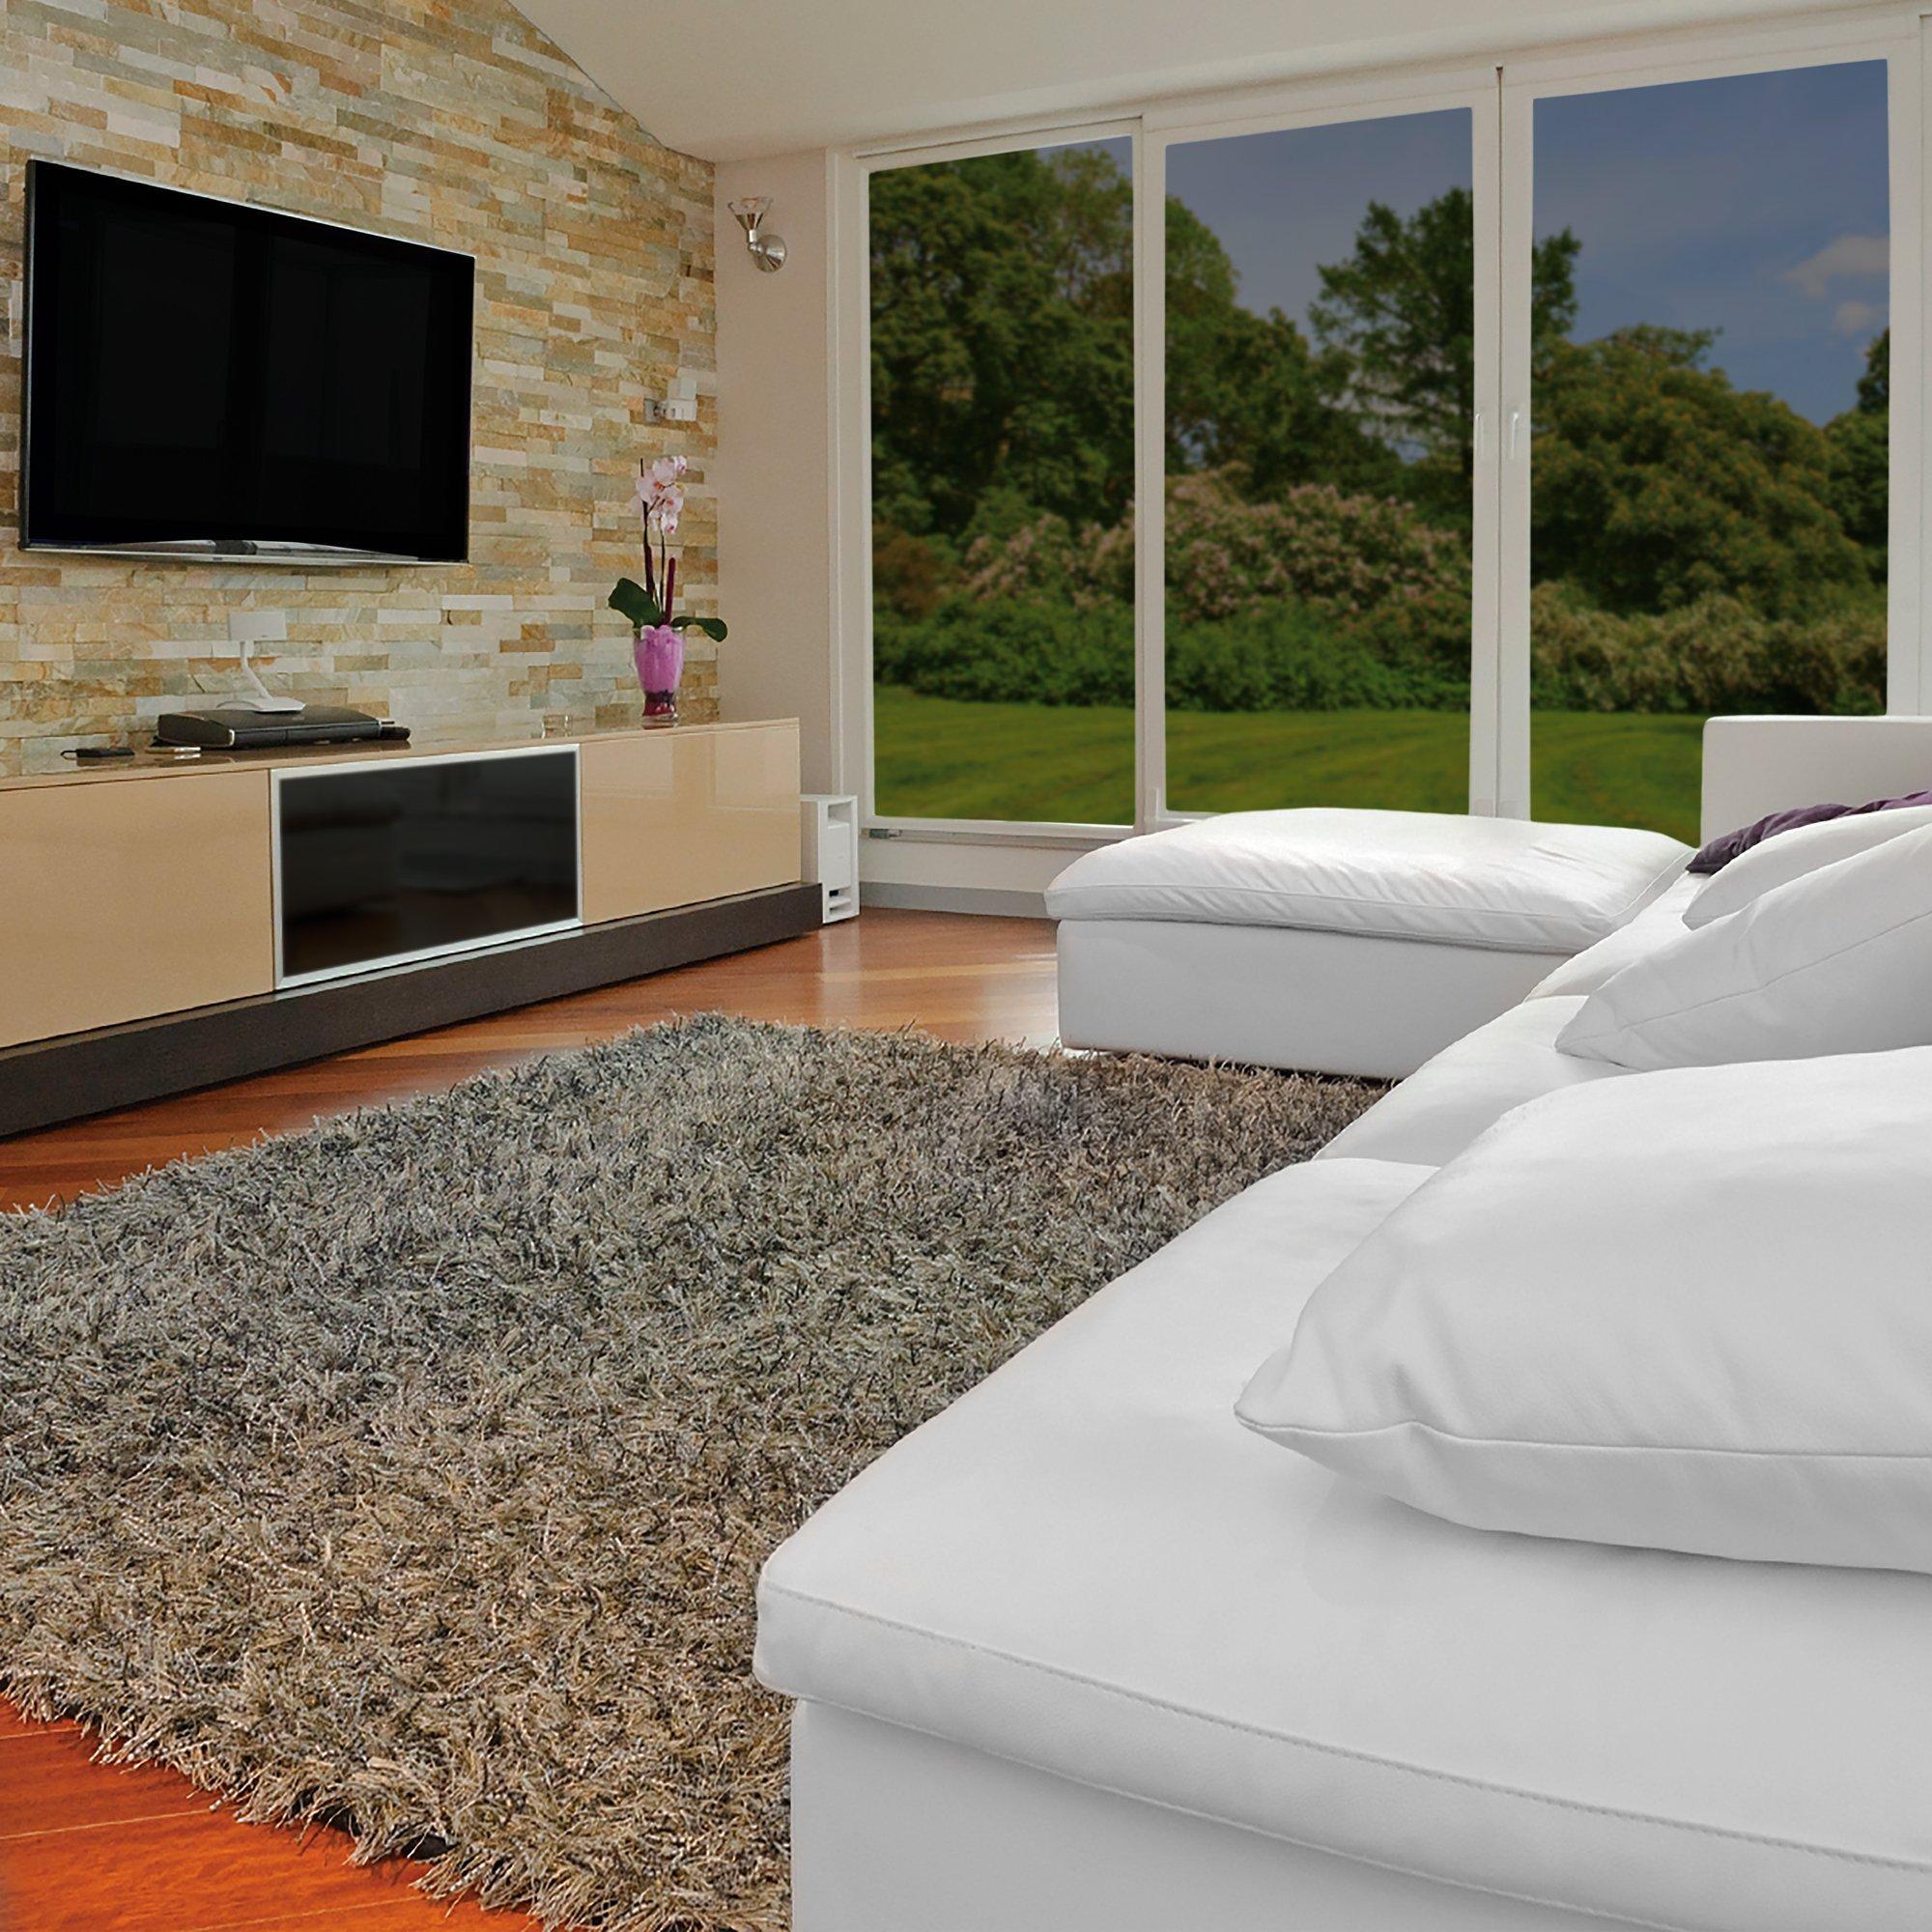 Gila EGSG548 48 Inches by 100 Feet Heat Control Residential Window Film, Platinum by Gila (Image #2)